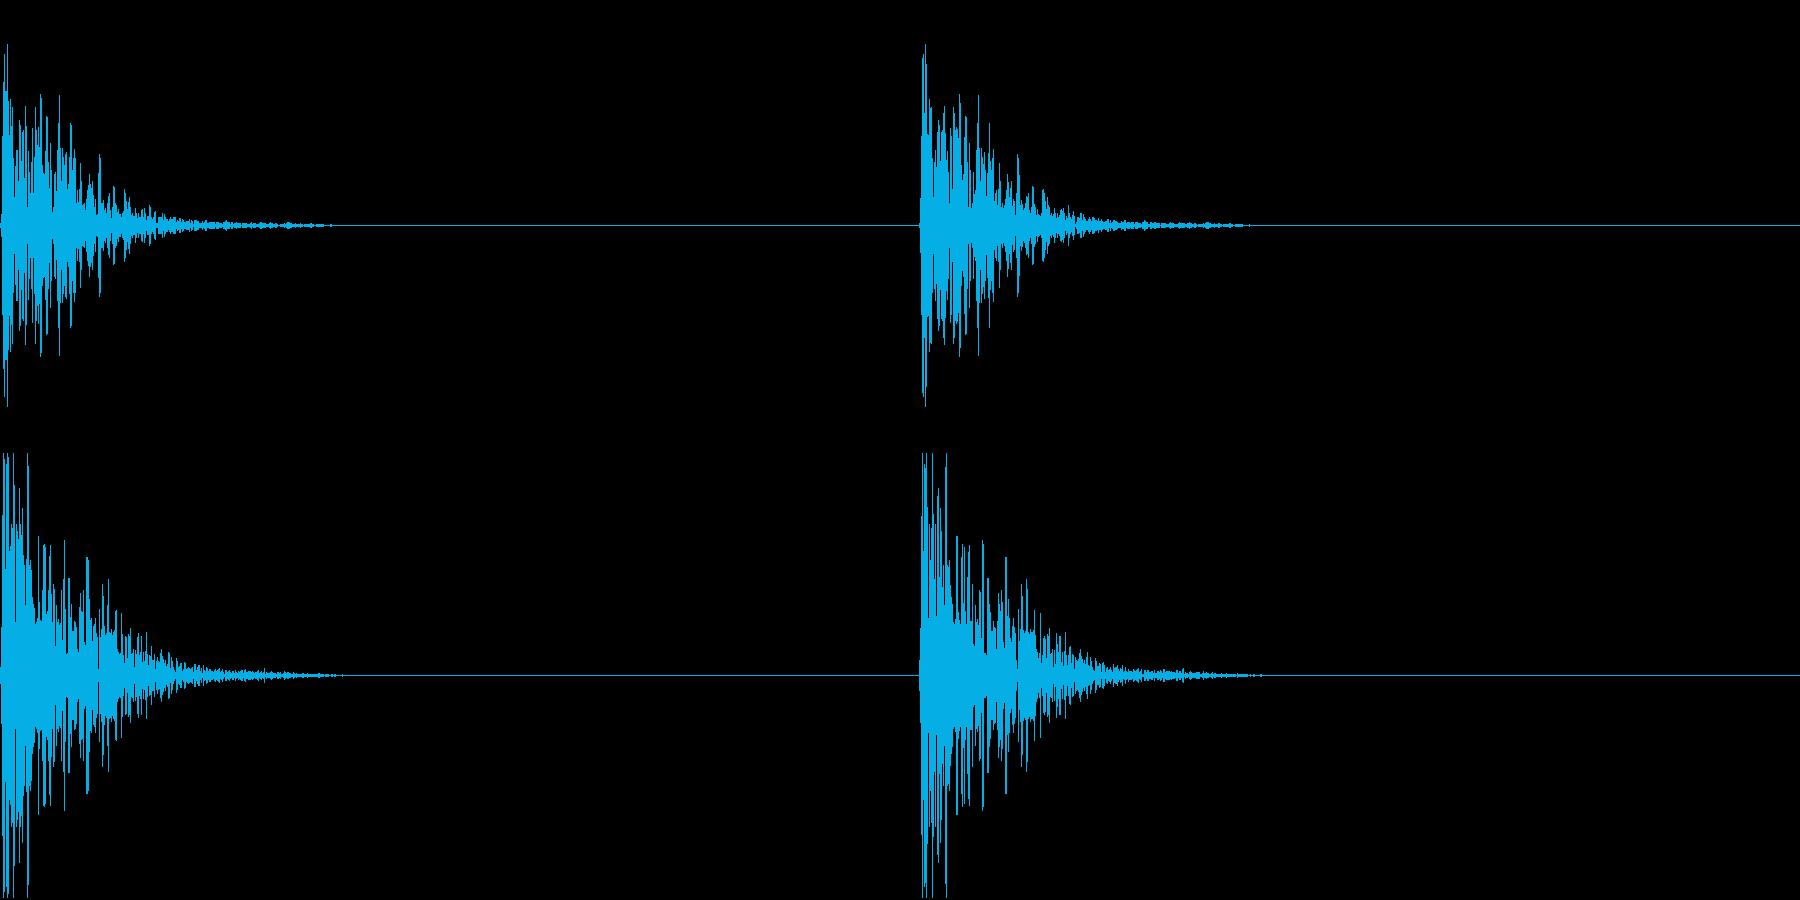 DIY 釘を打つ金槌の音 コンコンの再生済みの波形